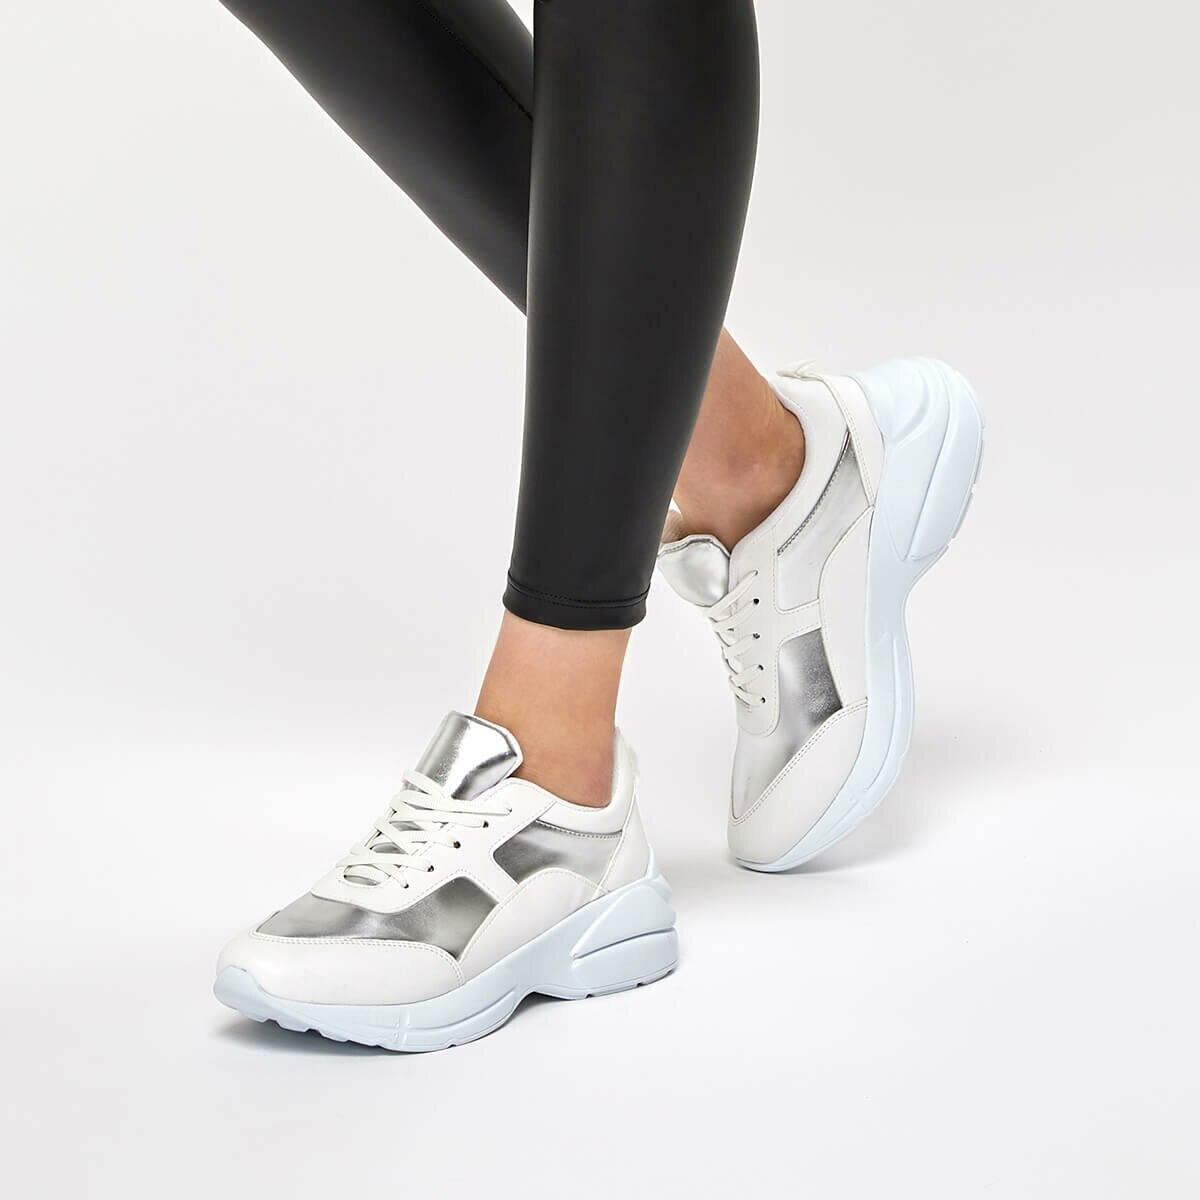 FLO 92.314725LZ Black Women Sneaker Polaris